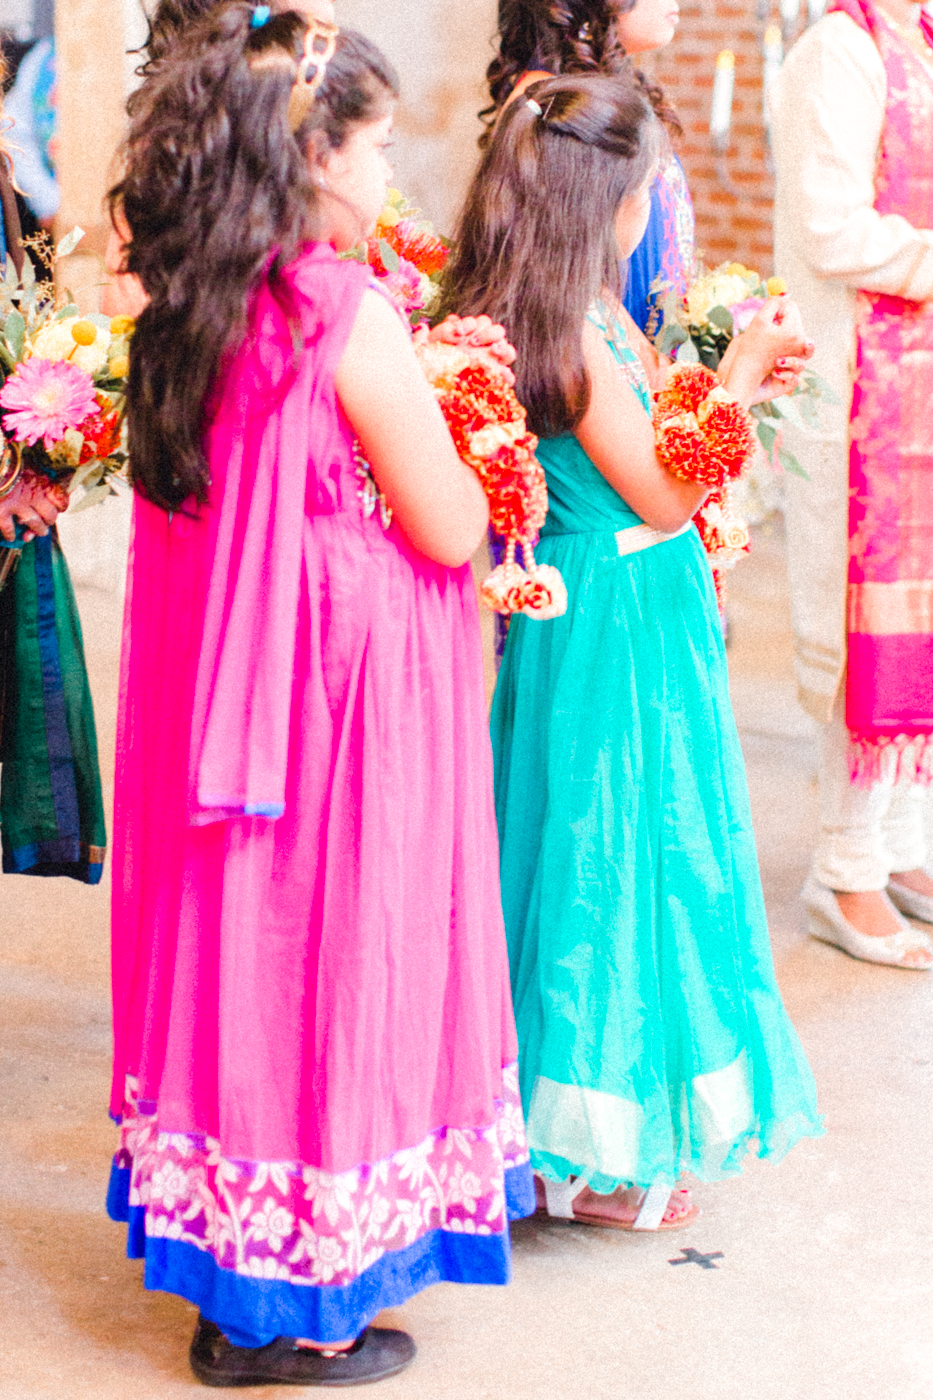 four corners photography atlanta wedding photographer indian wedding 550 trackside wedding atlanta indian wedding photographer (14 of 54).jpg